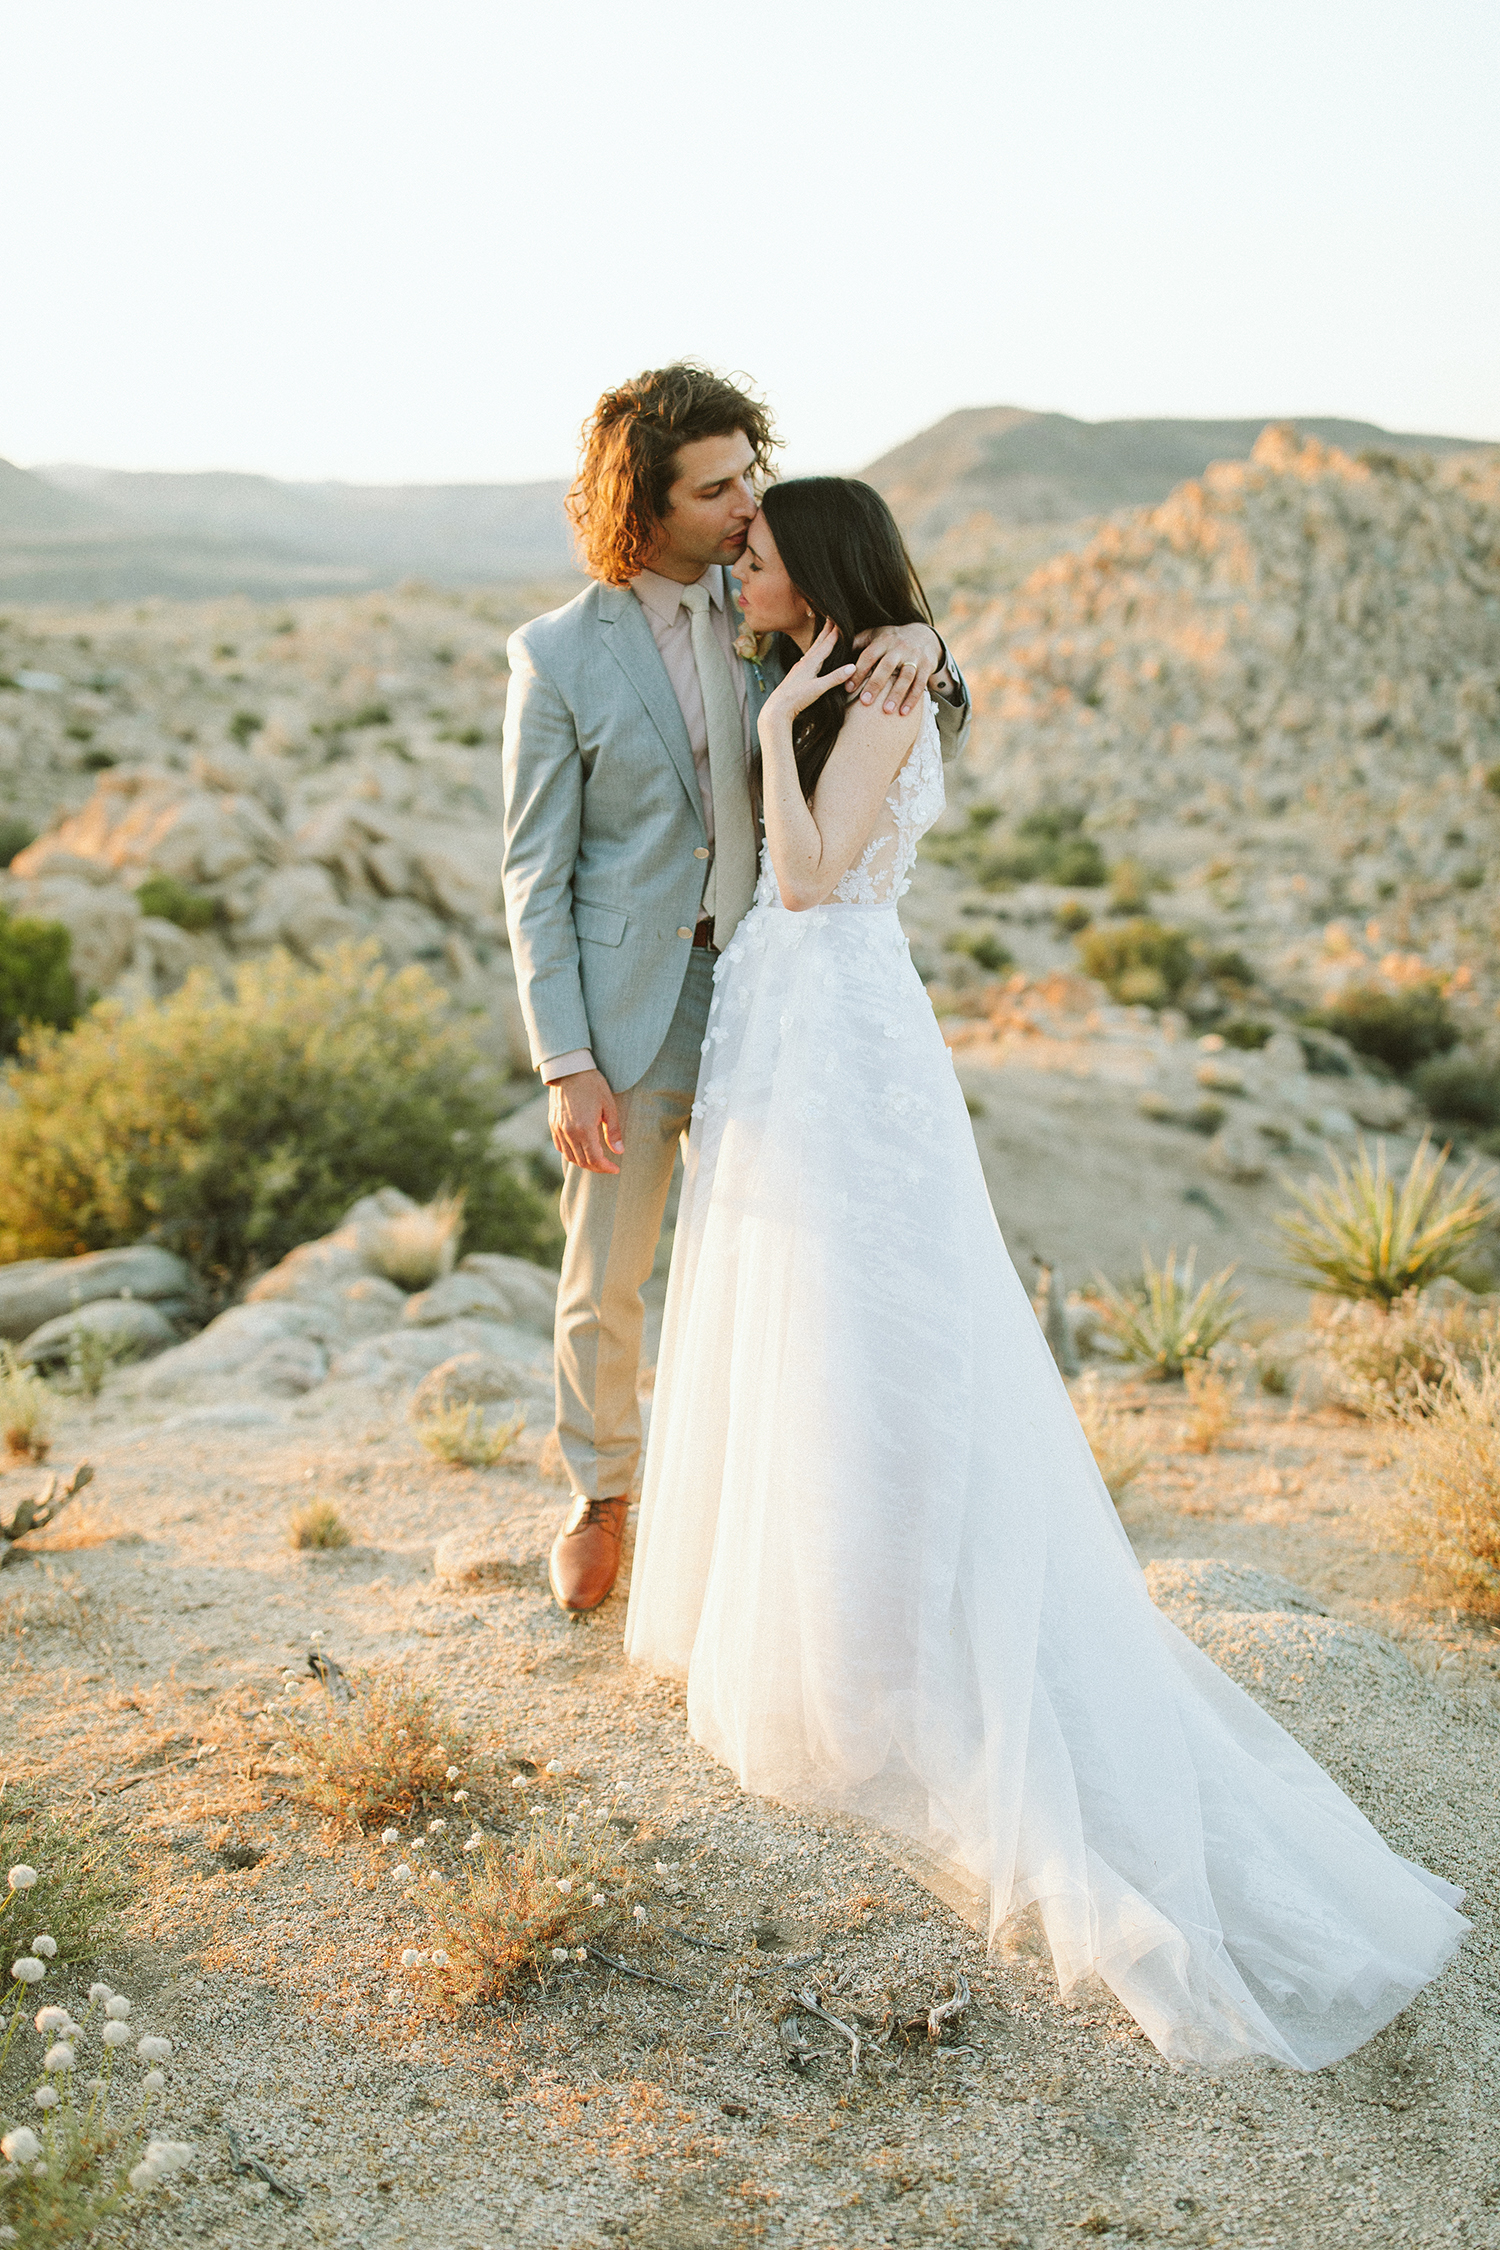 ashley basil wedding couple with desert hills